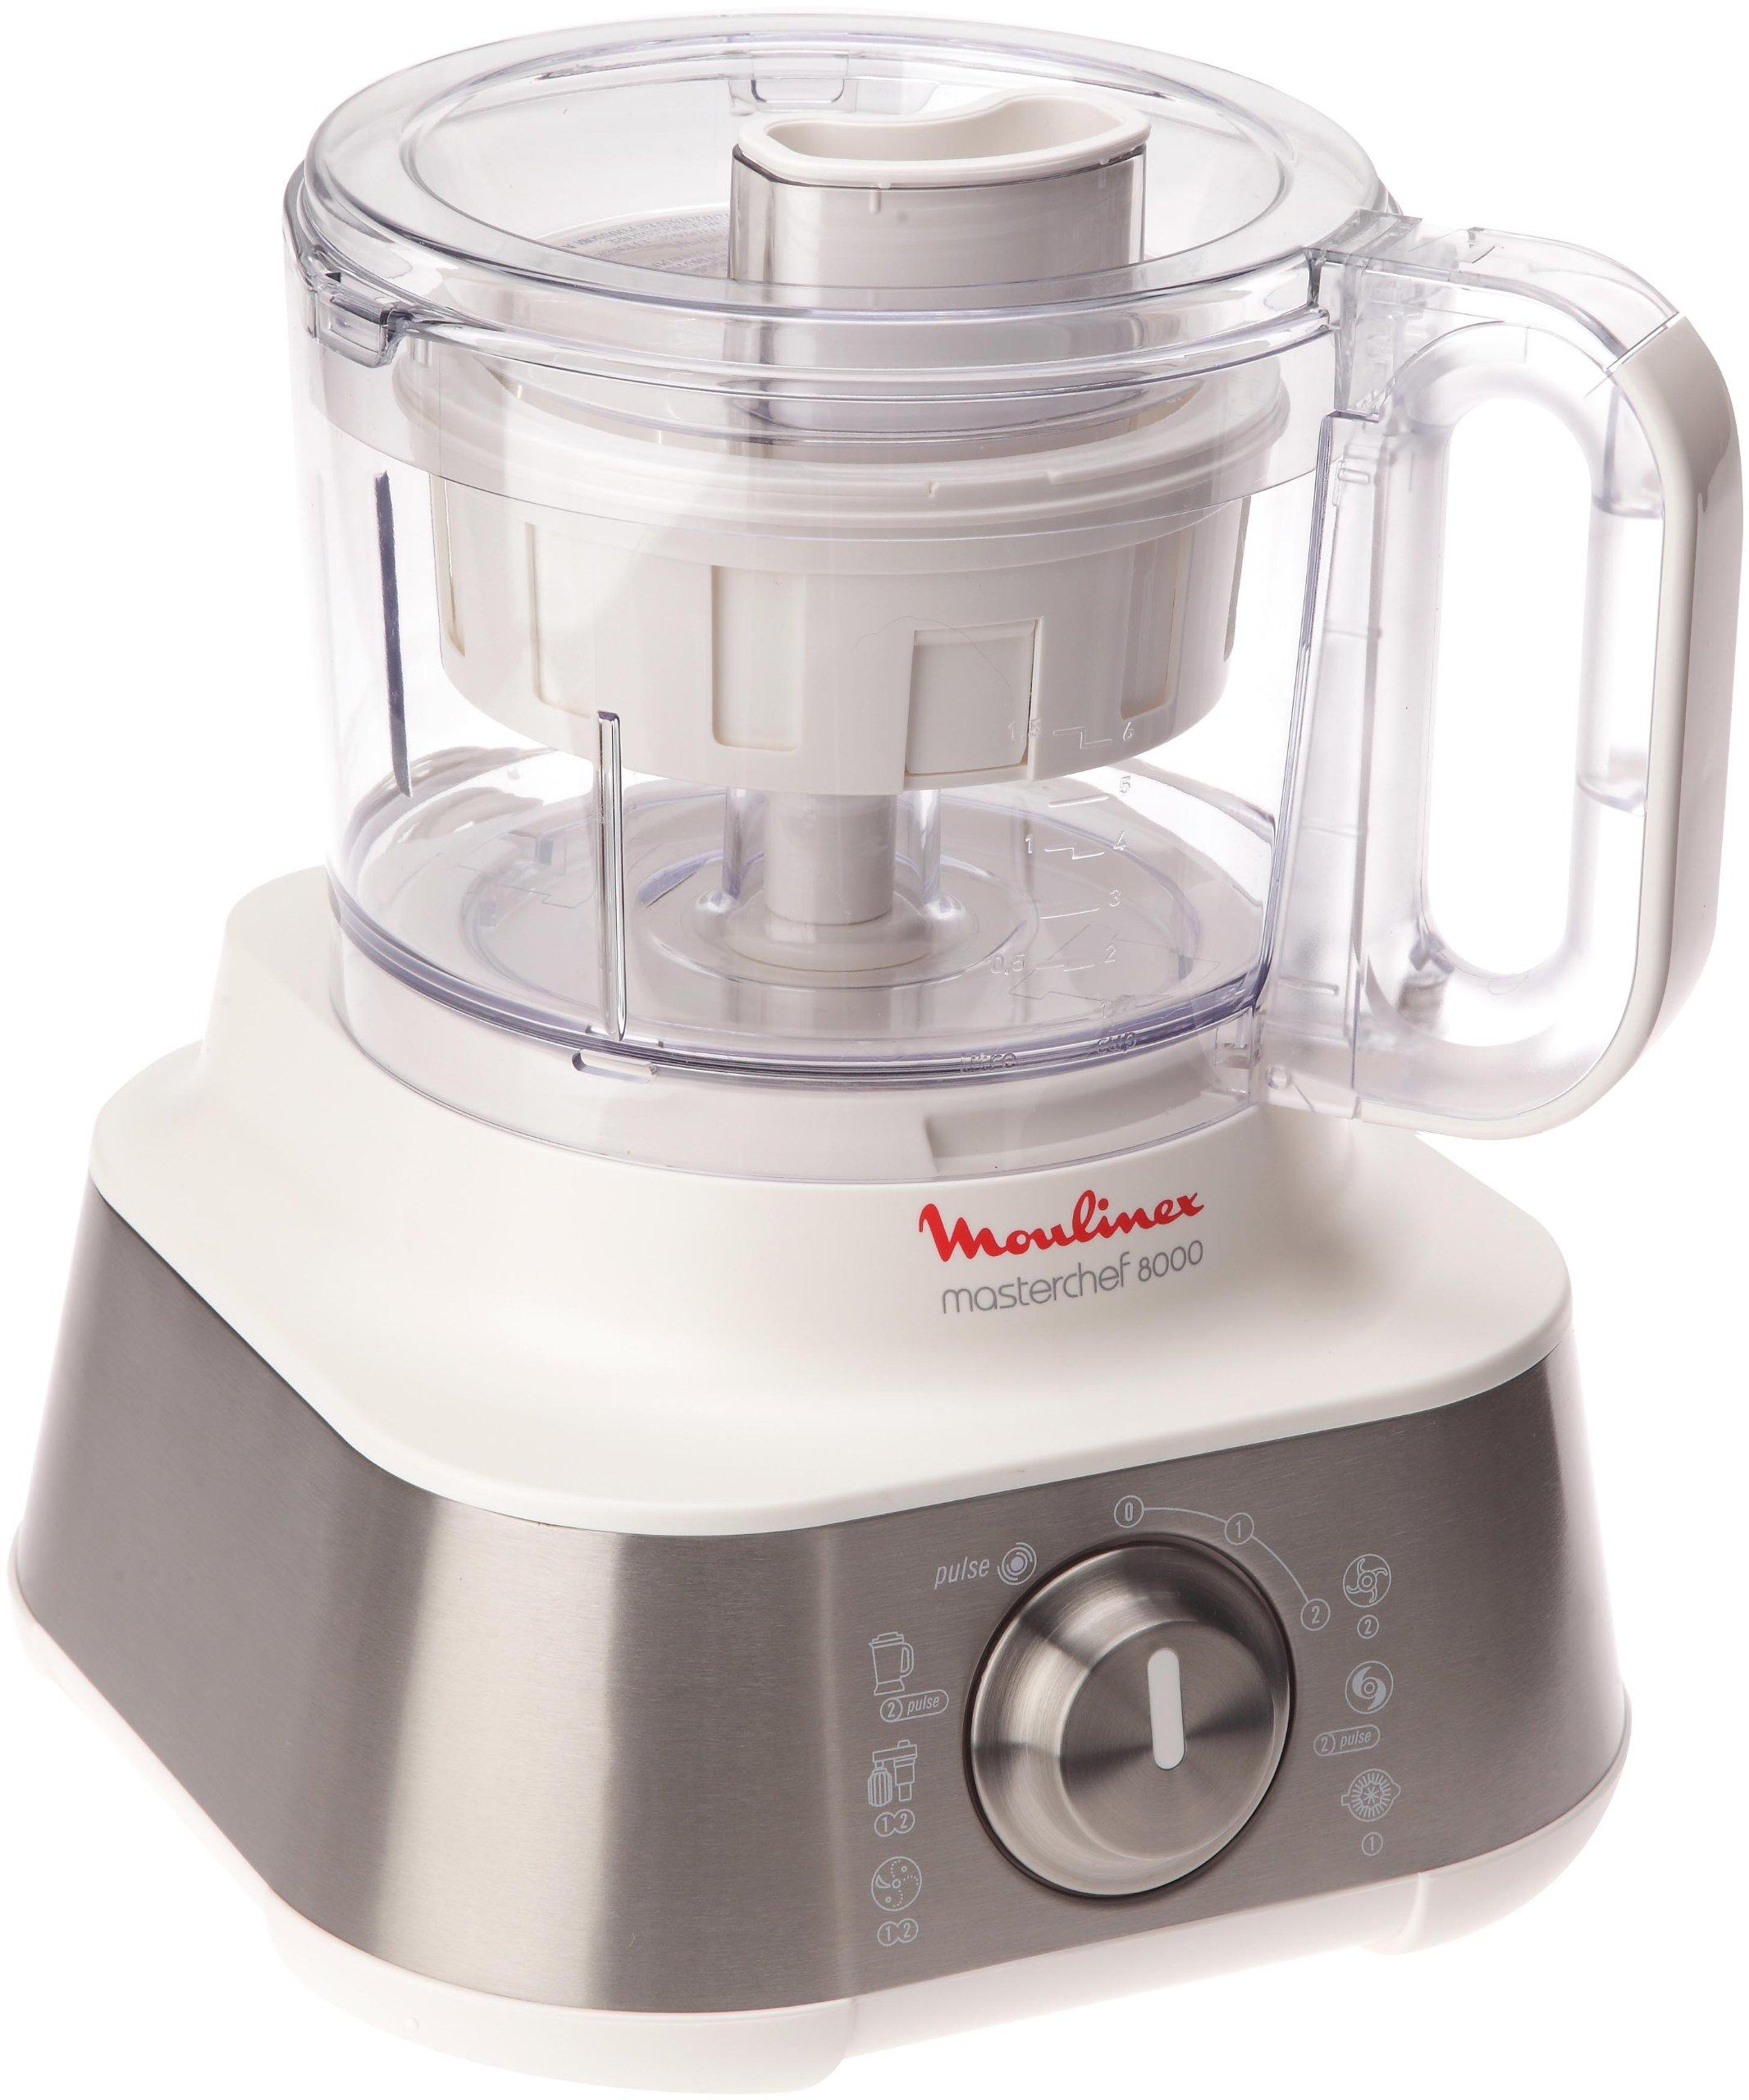 Moulinex Masterchef 8000 - Robot de cocina (3 L, Plata, Blanco, Giratorio, 1,5 L, Vidrio, Acero inoxidable): Amazon.es: Hogar